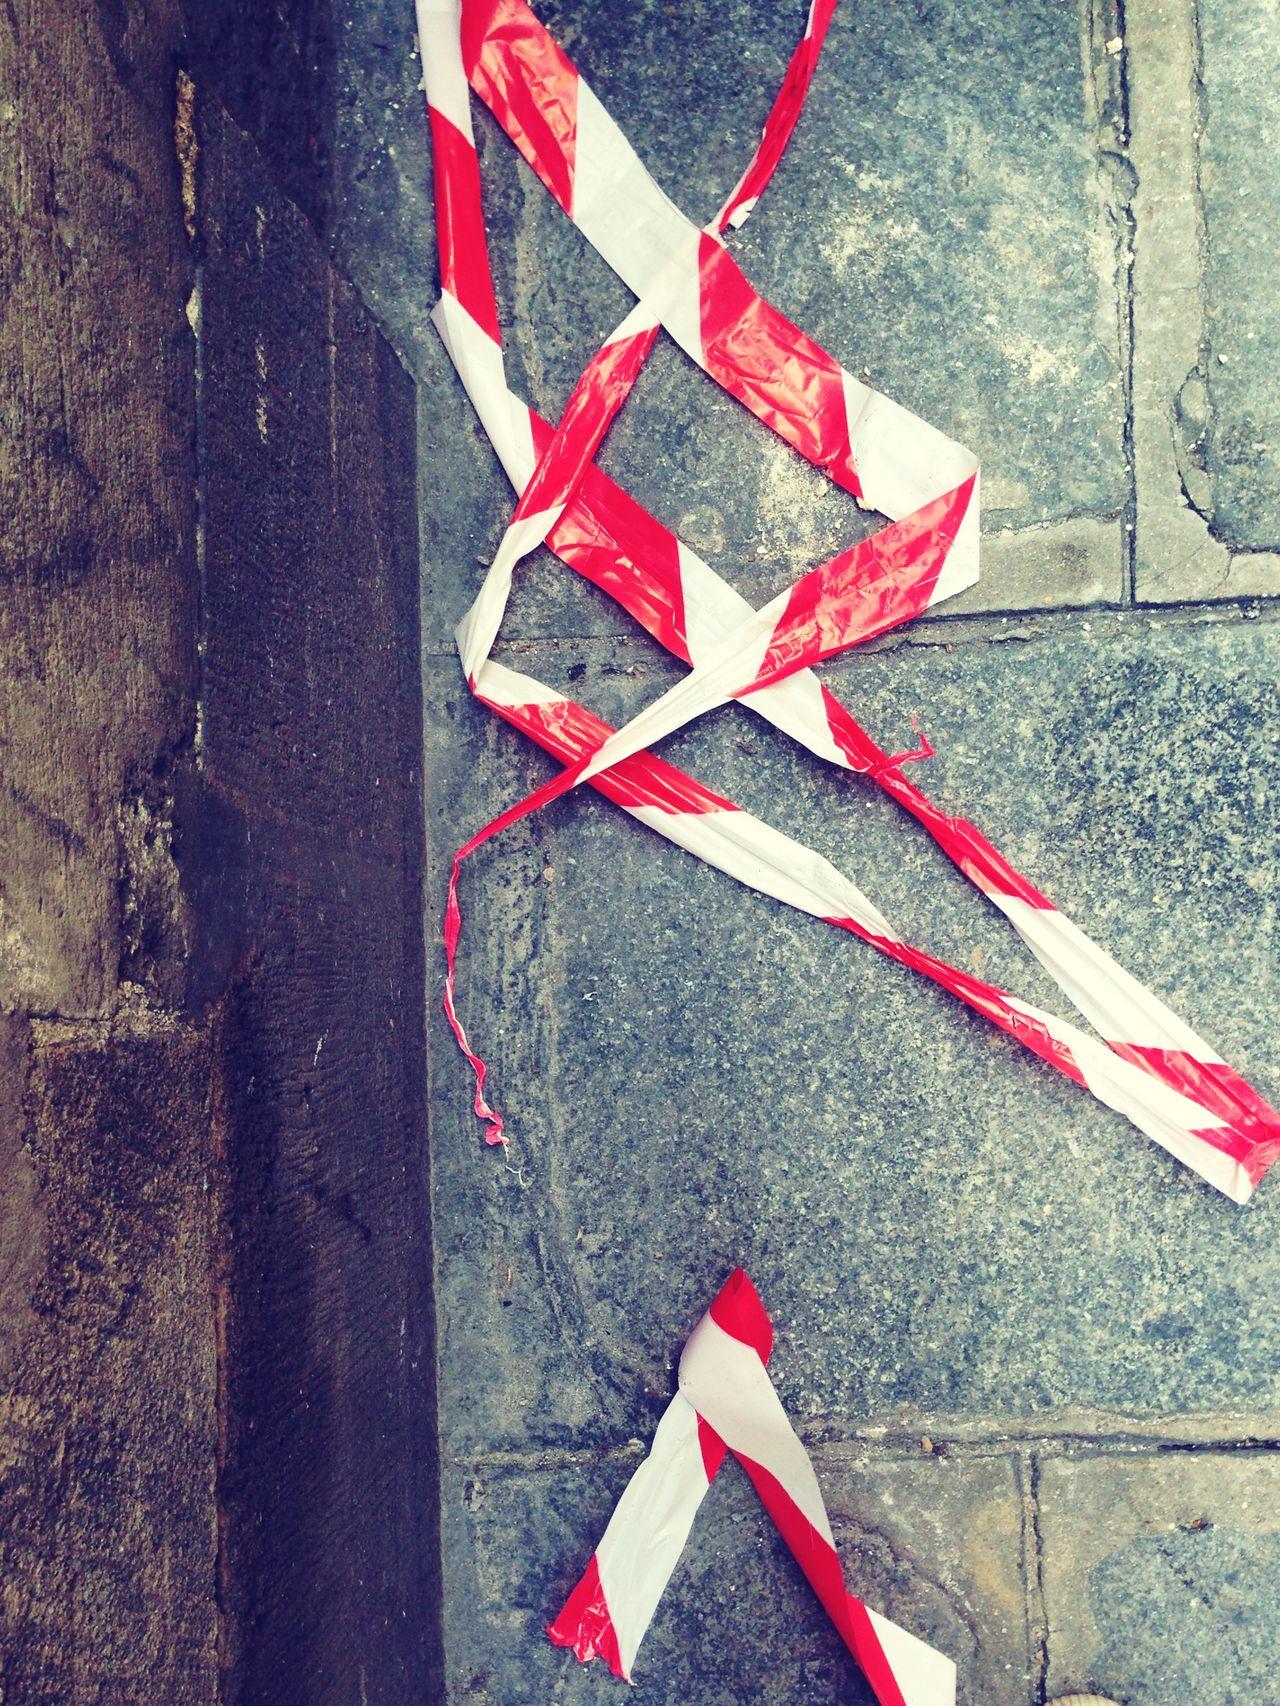 Streetphotography Street Street Photography Streetphoto_color Streetphoto Streetlife Rubber Redandwhite Choreography Sign